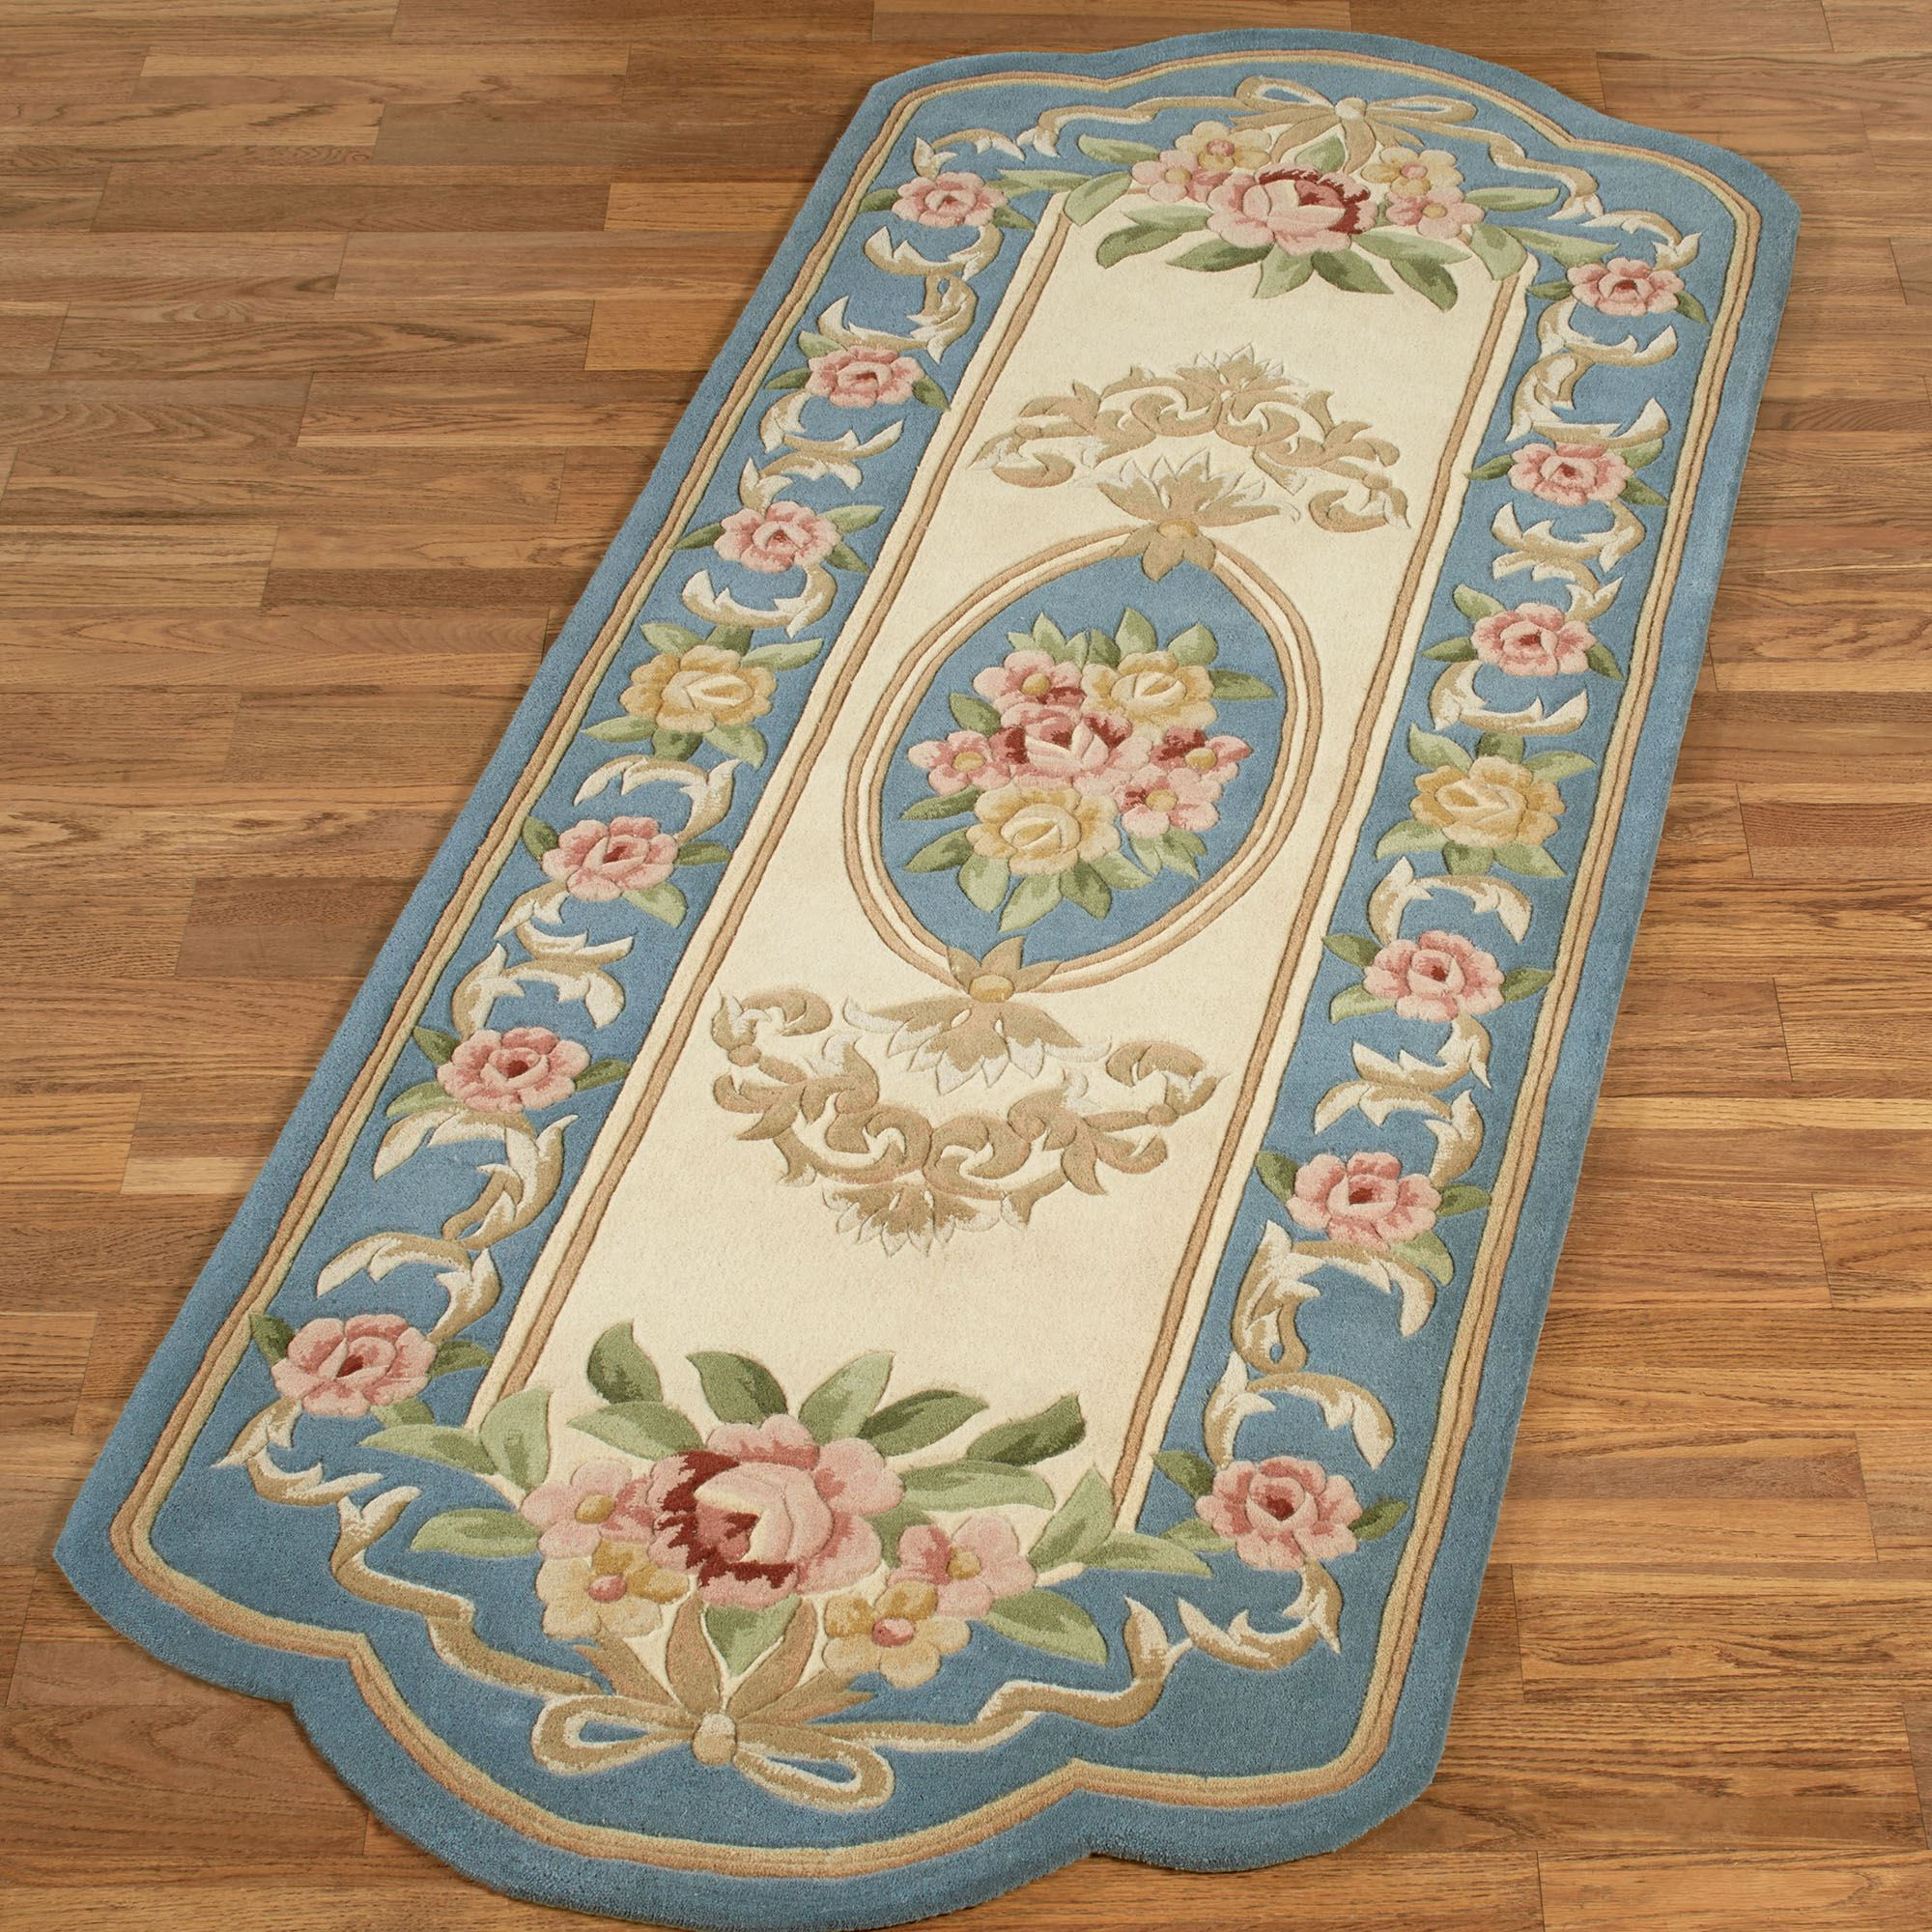 pics Flower Carpet Portia portia rose sapphire aubusson area rugs